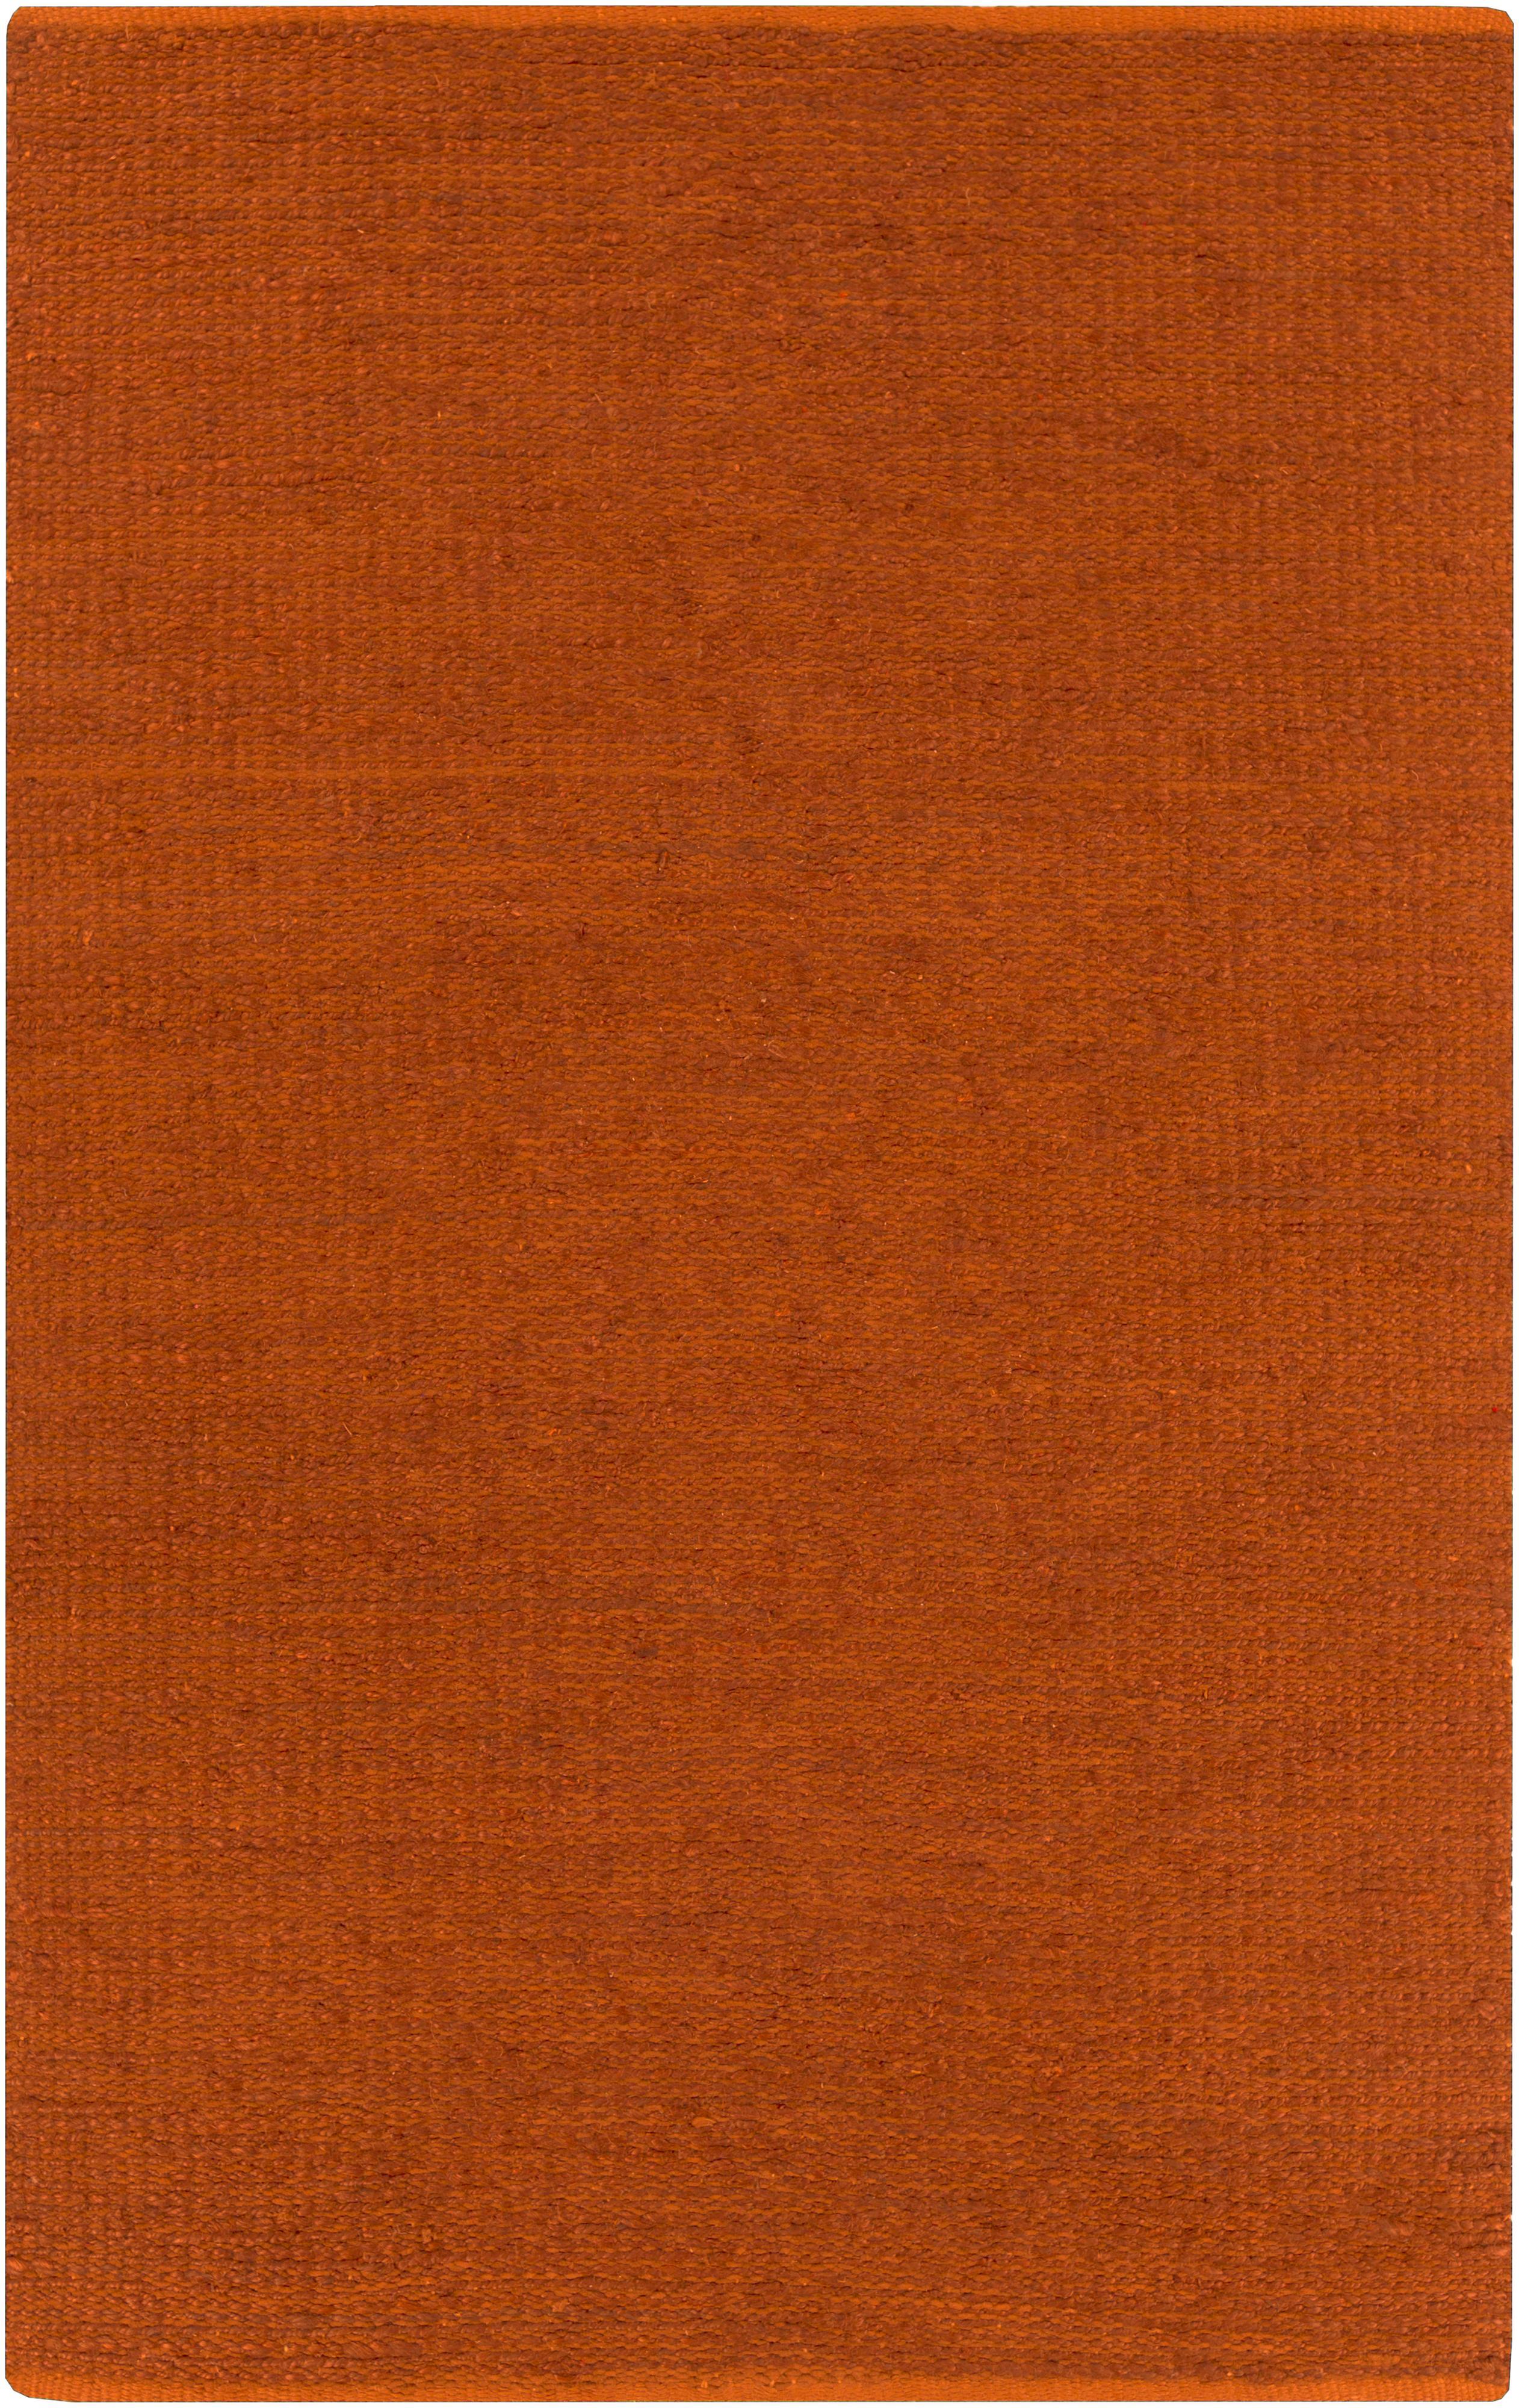 Surya Rugs Tonga 2' x 3' - Item Number: TGA6002-23